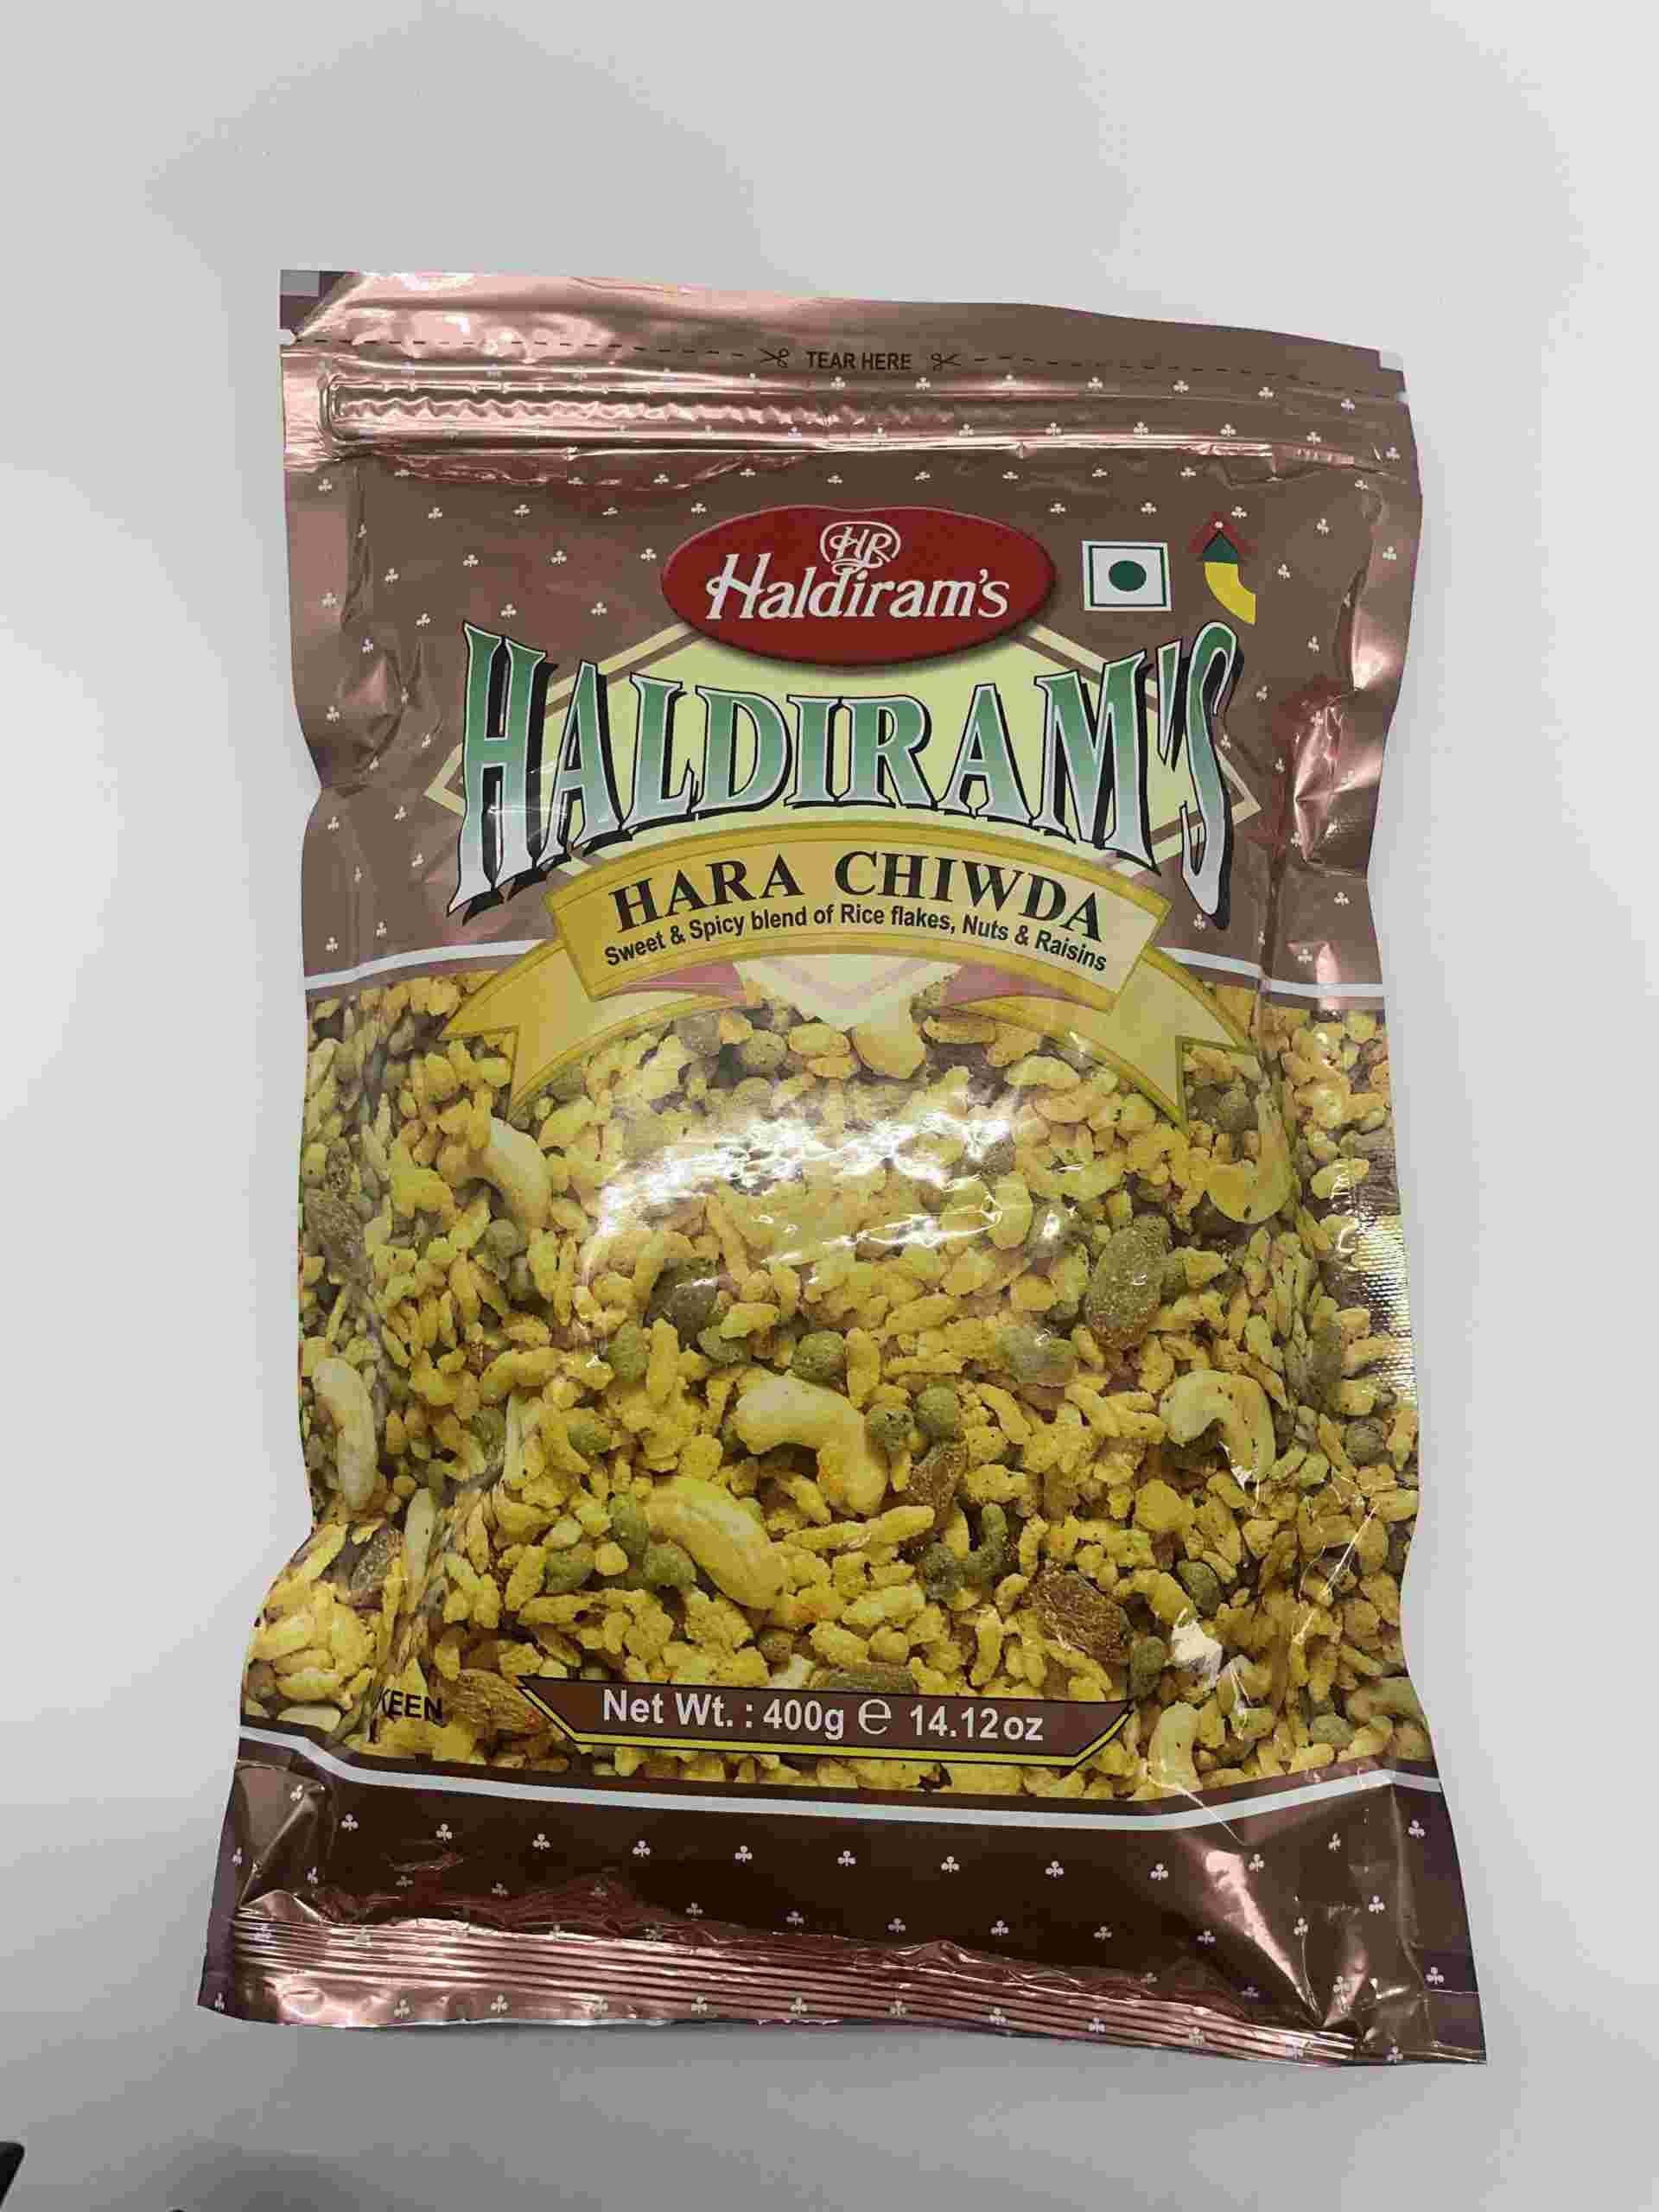 Haldiram's HARA CHIWDA